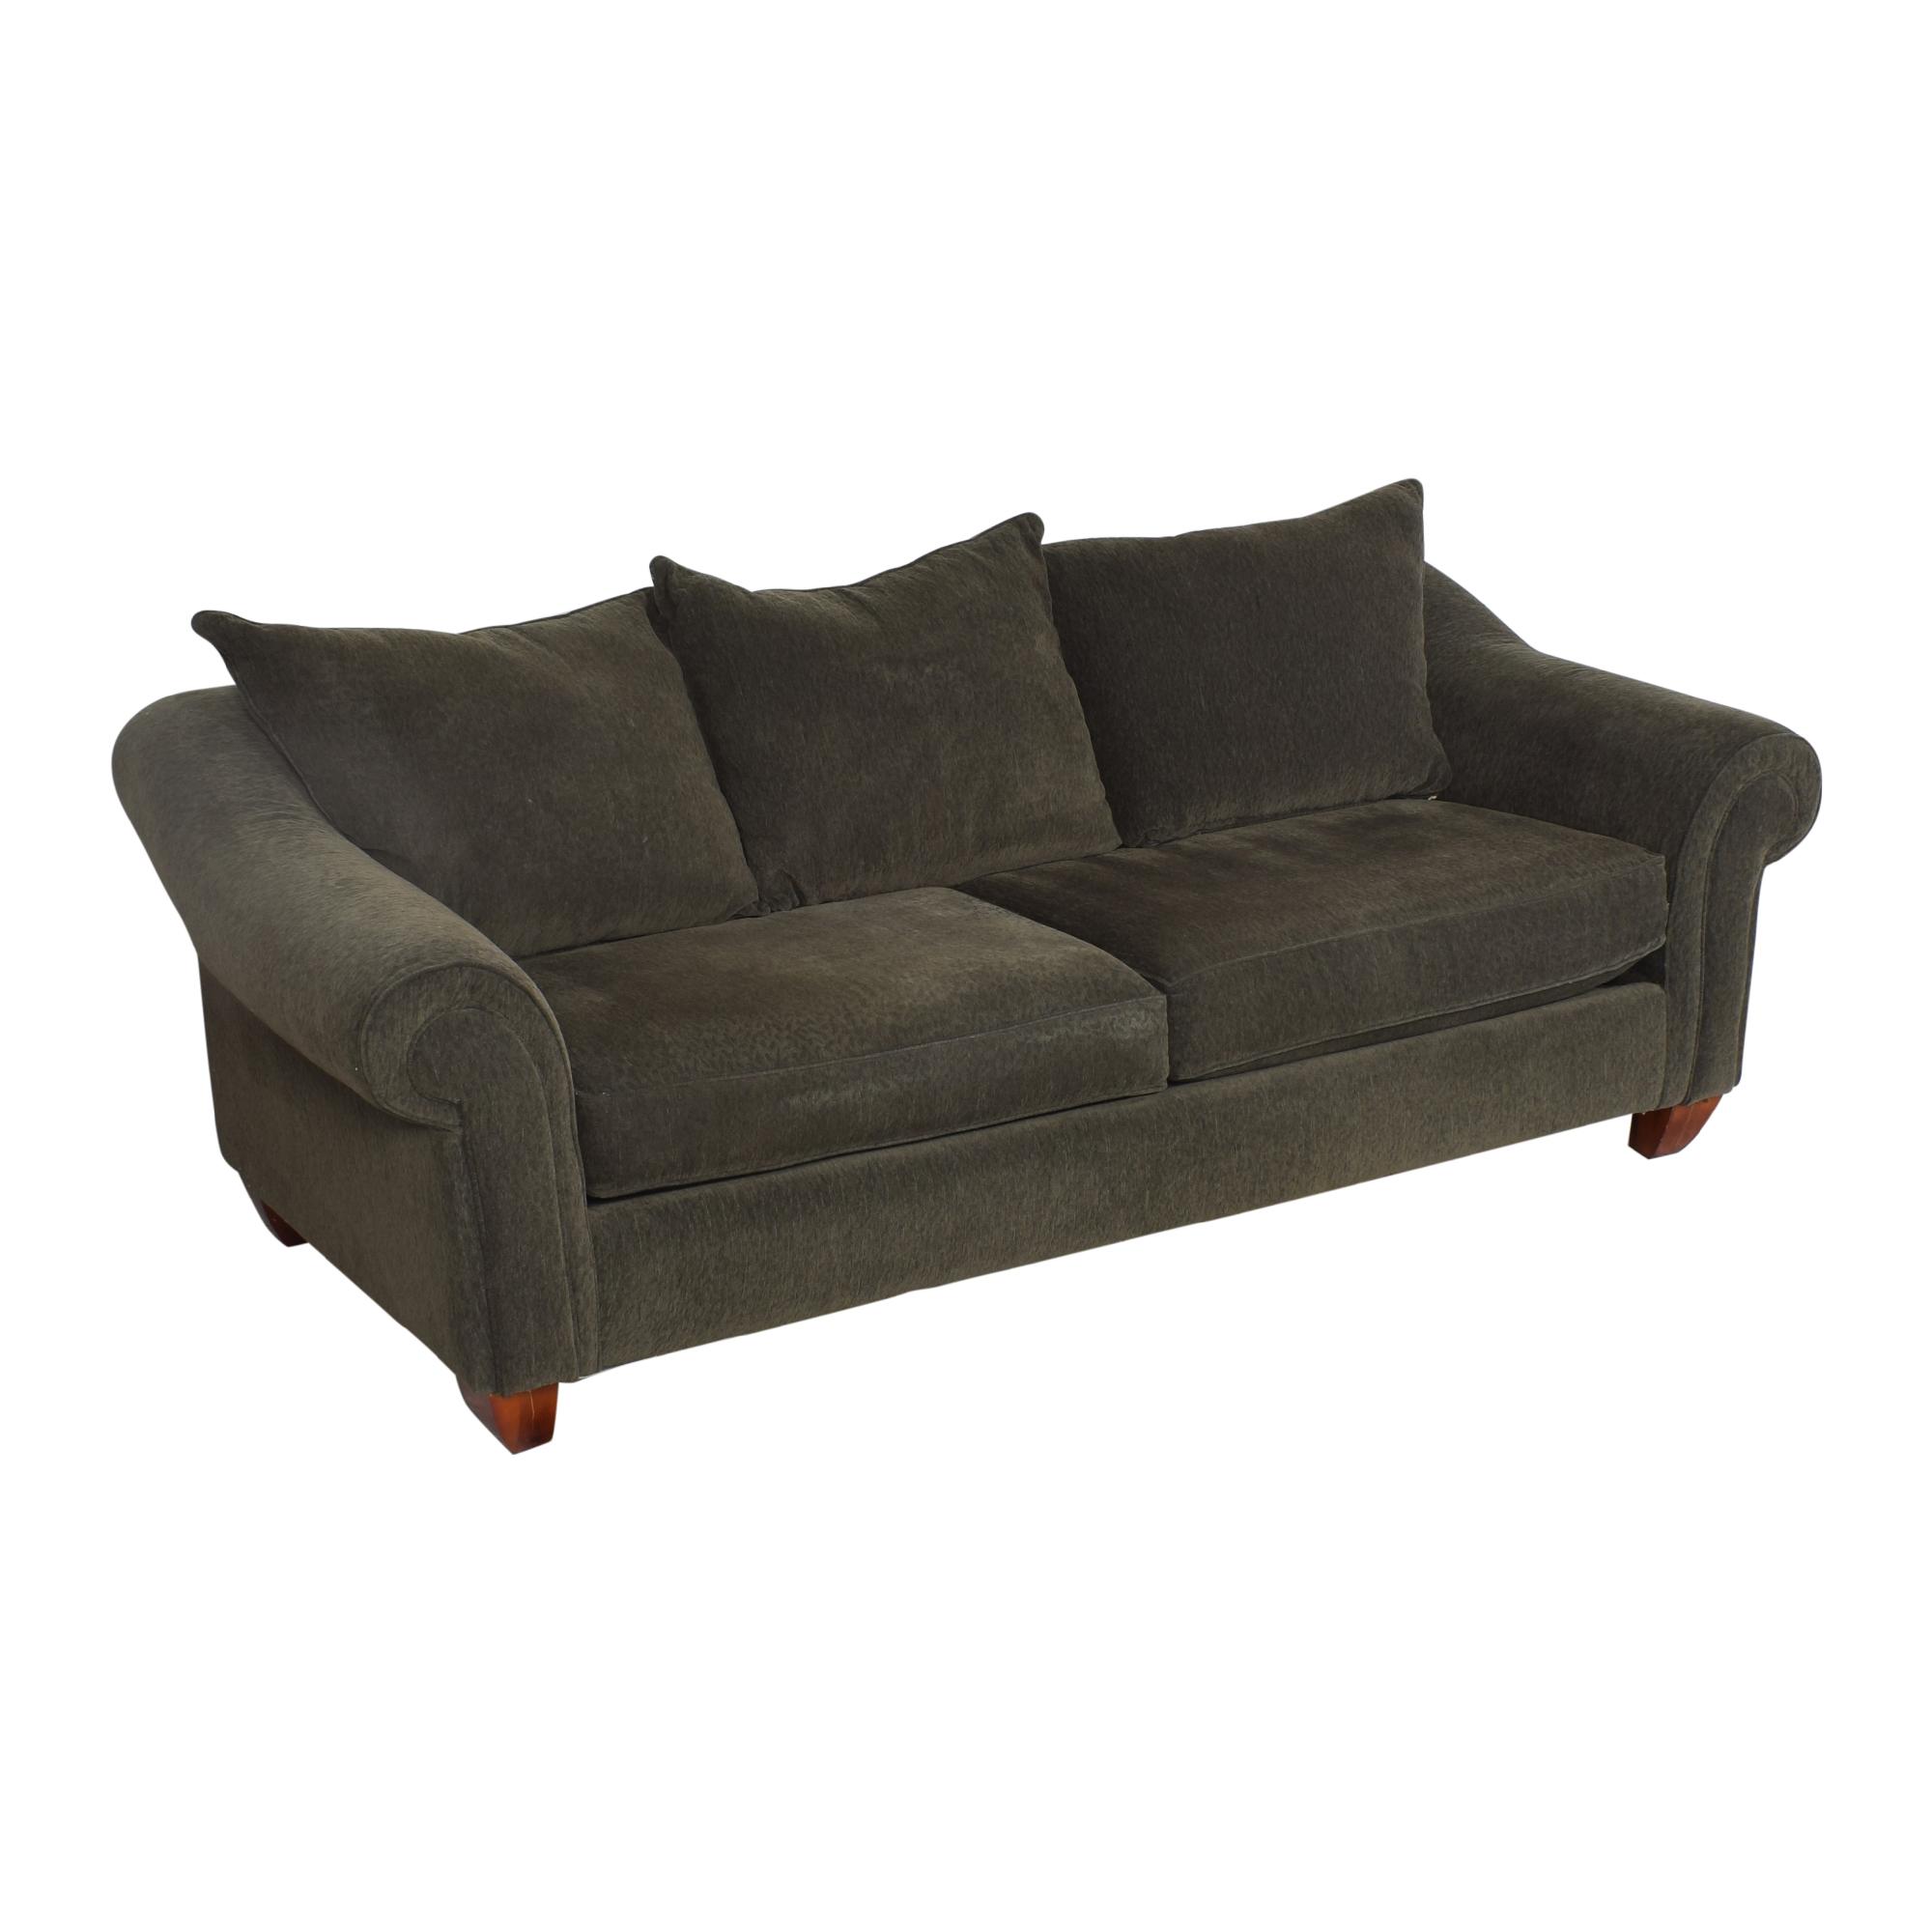 buy Raymour & Flanigan Molly Sofa Raymour & Flanigan Classic Sofas